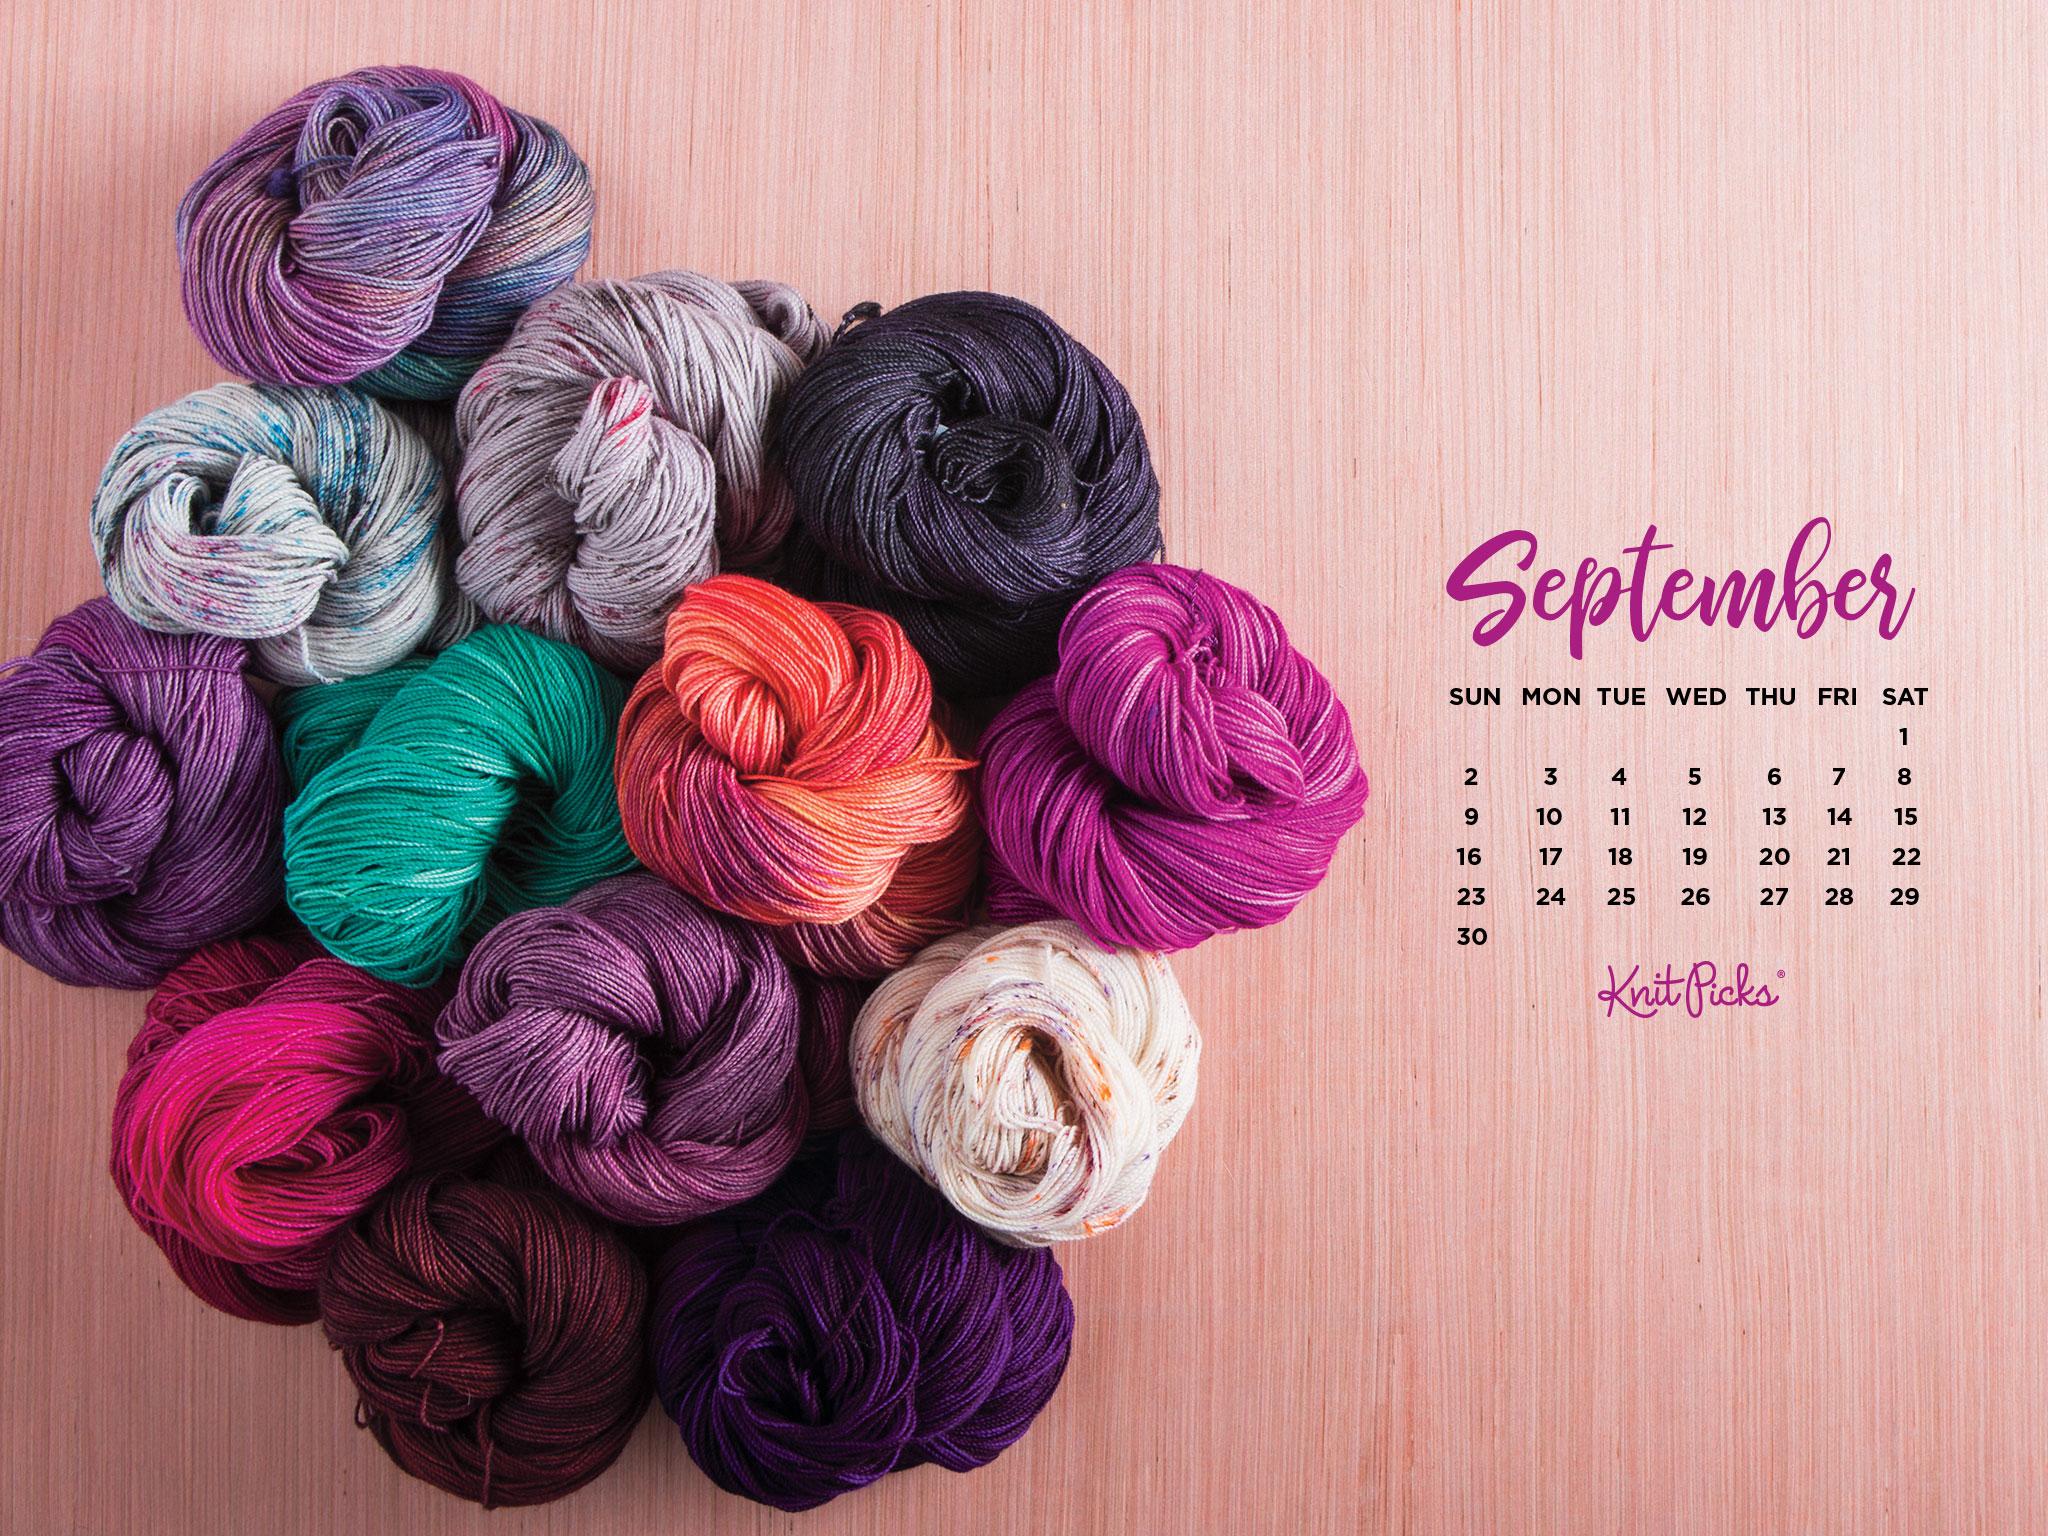 Pretty Wallpapers For Fall Free Downloadable September 2018 Calendar Knitpicks